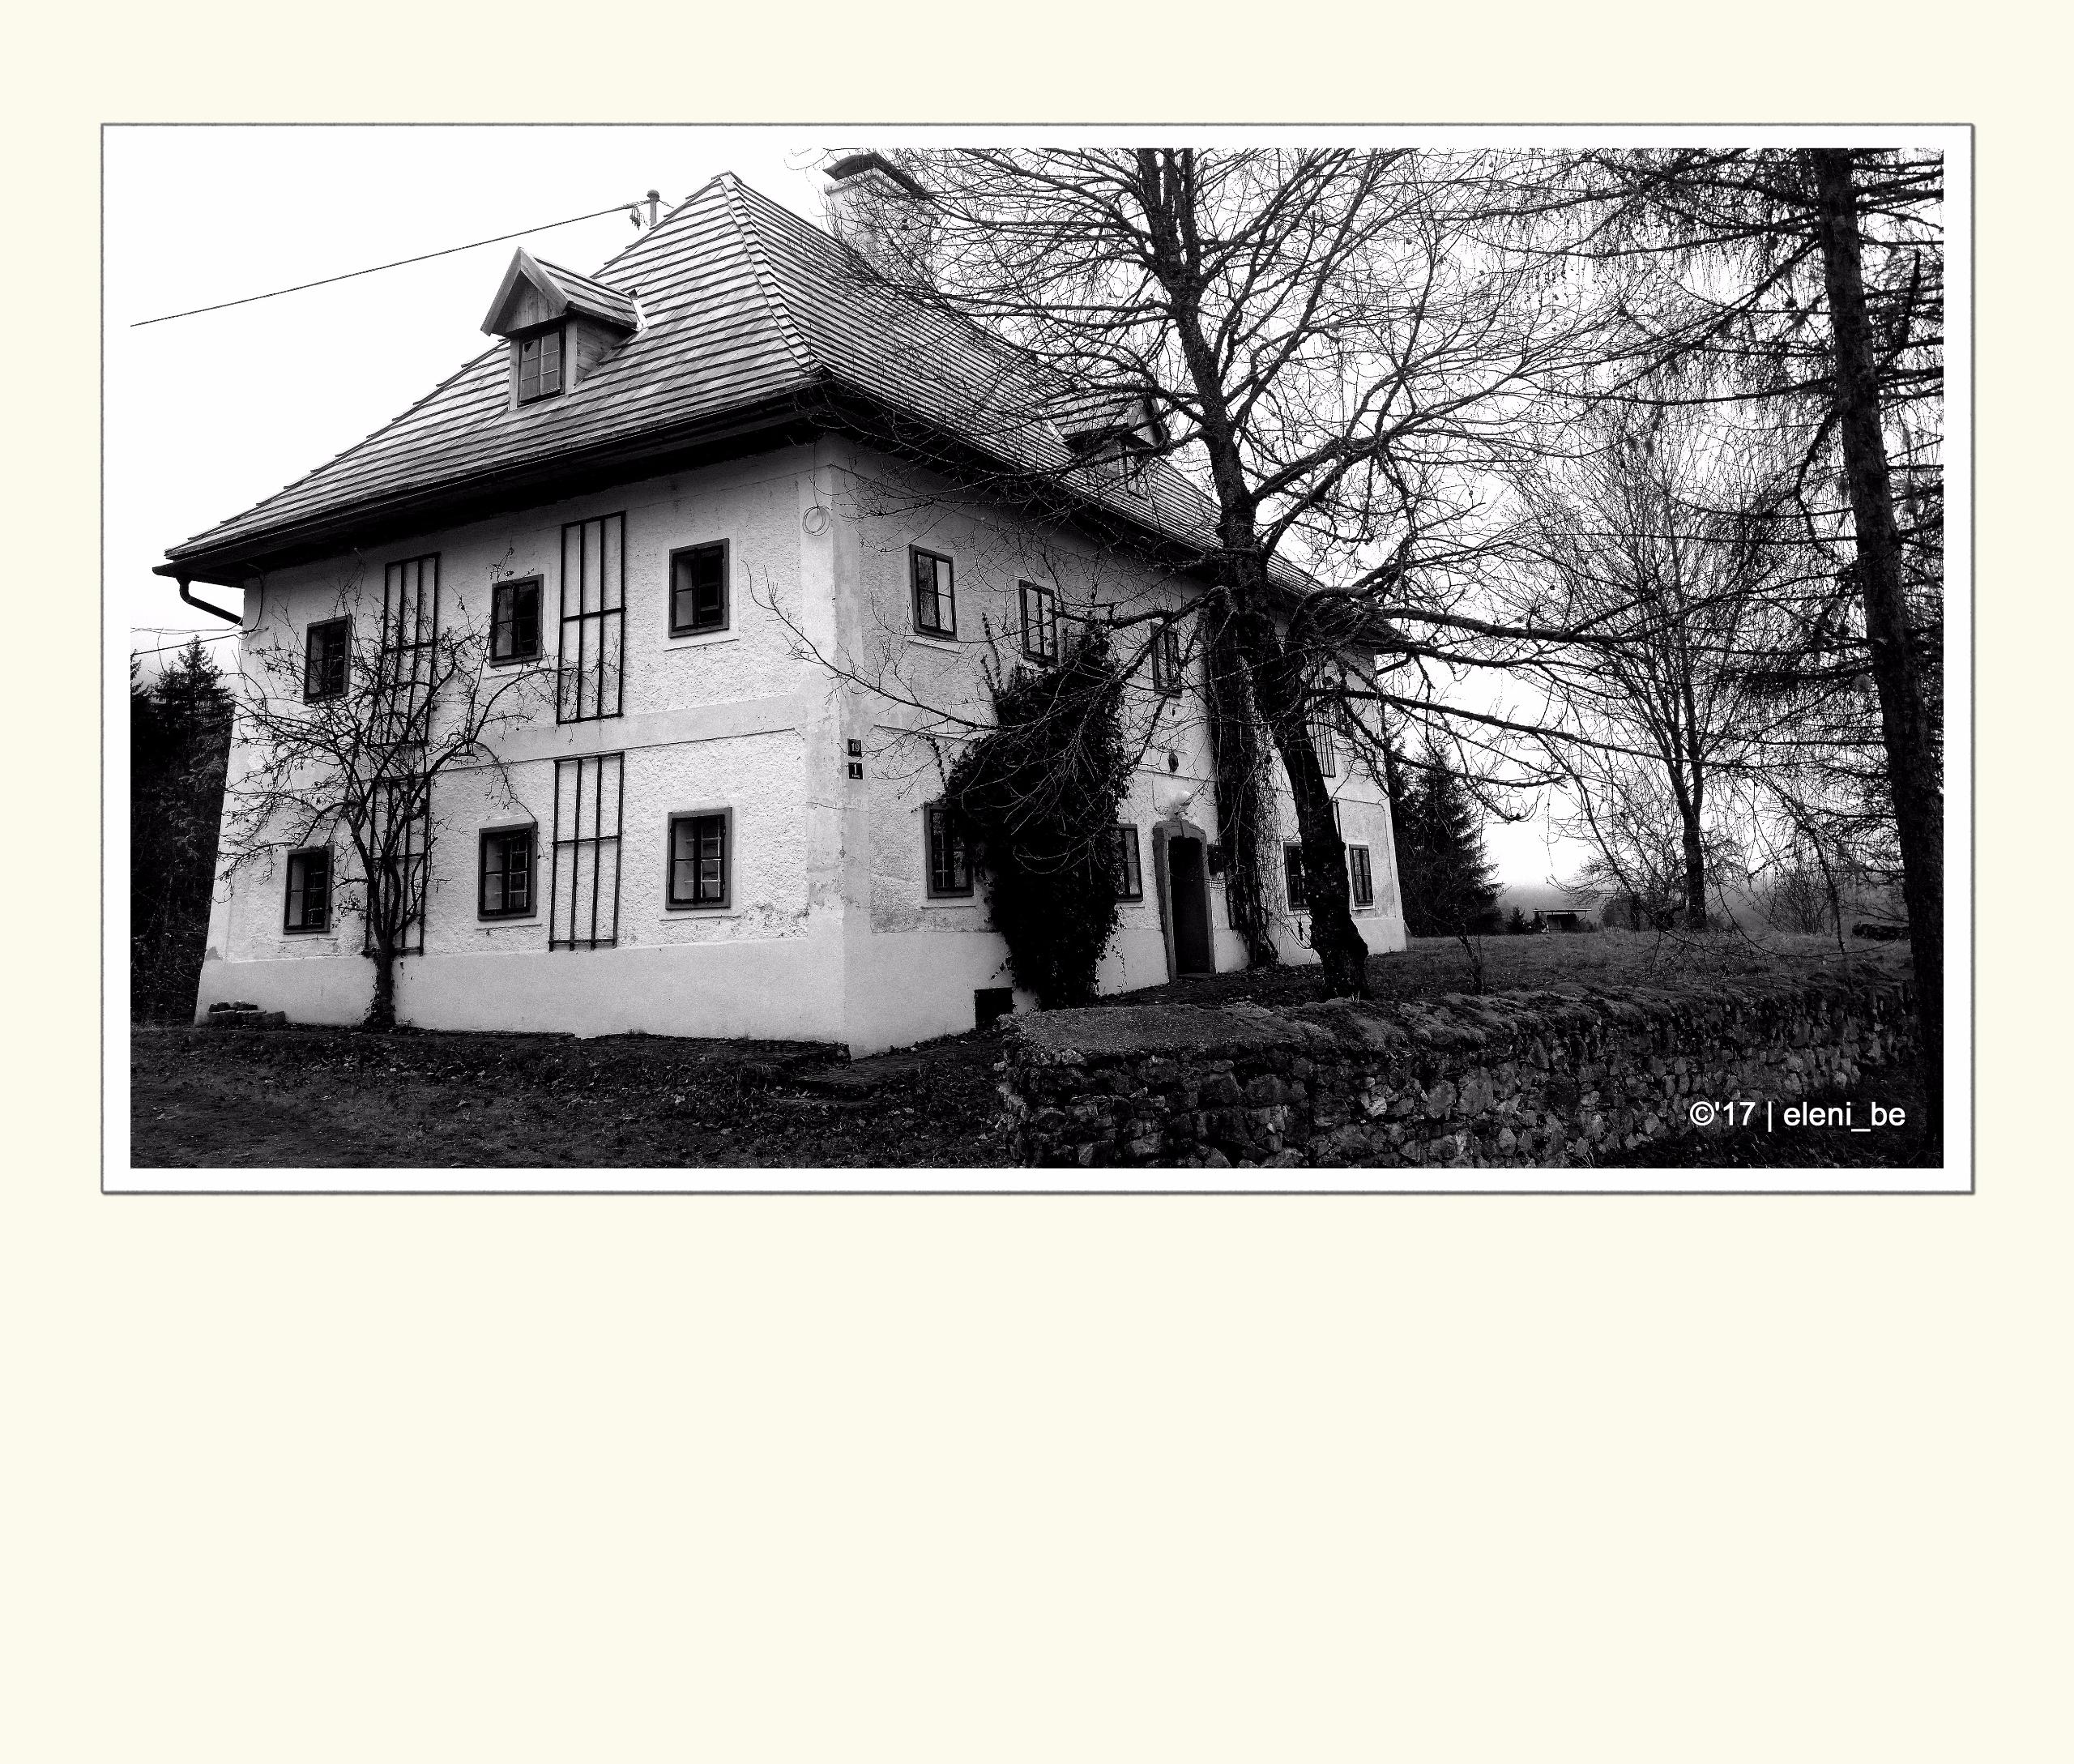 Cottage (Upper Austria | ca. 17 - eleni_be | ello